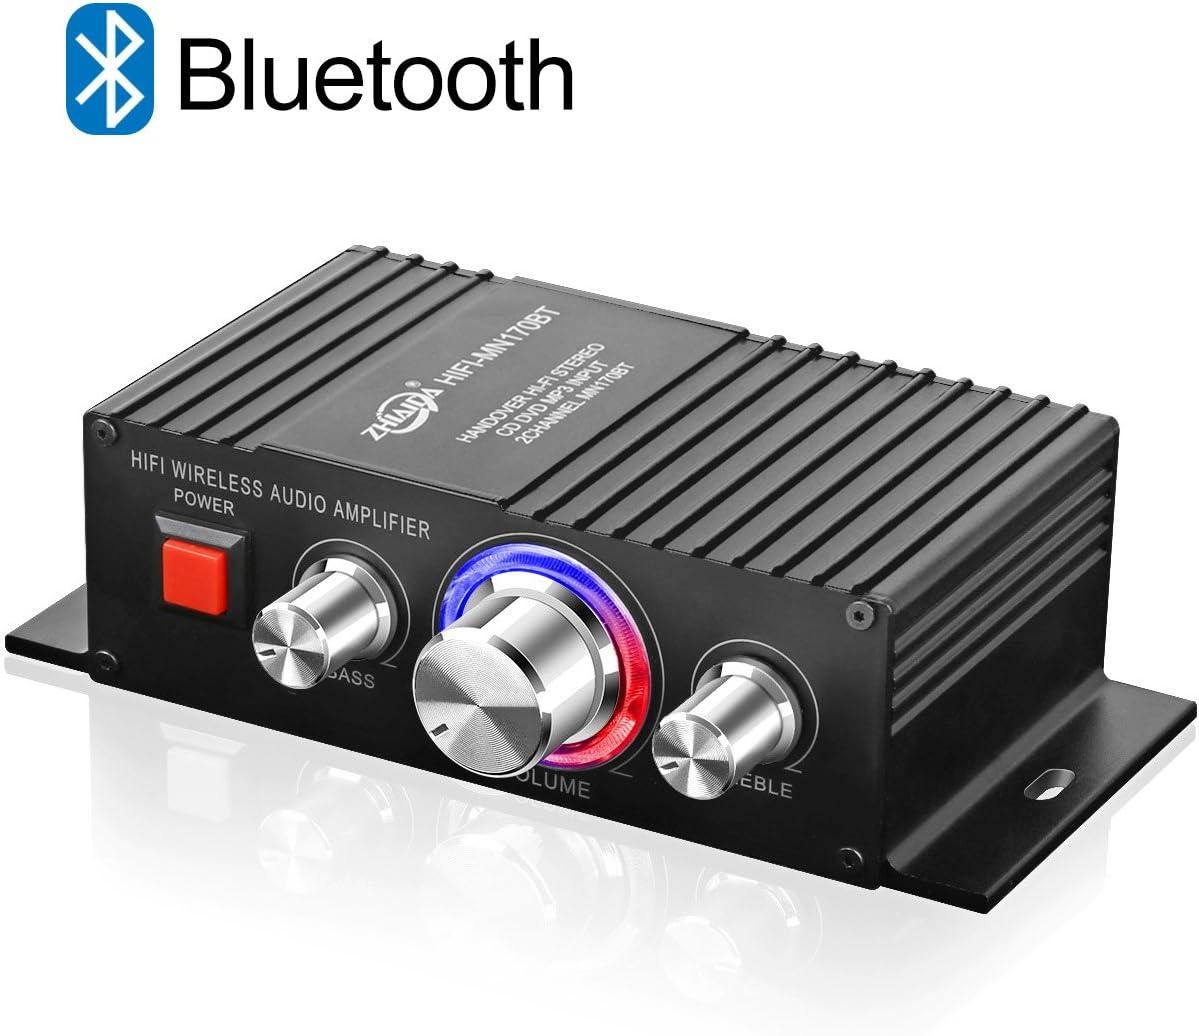 TTMOW Mini Amplificador Bluetooth 4.2 Digital 100W (2 x 50W) HiFi Audio Amp Super Bass para Tablet PC Portátiles Smartphone Auto Coche MP3 MP4 Altavoces (No Incluye el Adaptador, DC12-24V, 5-10A)